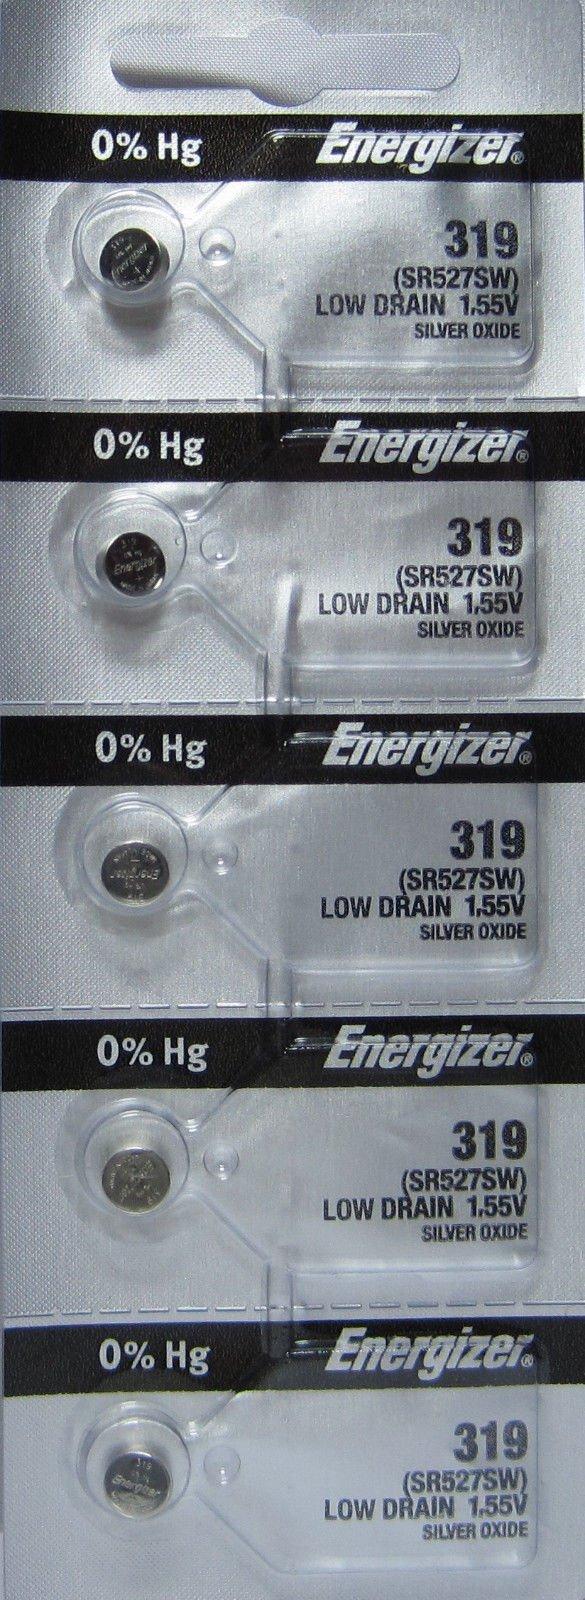 Energizer Batteries 319 (SR527SW) Silver Oxide Watch Battery. On Tear Strip (Pack of 5)